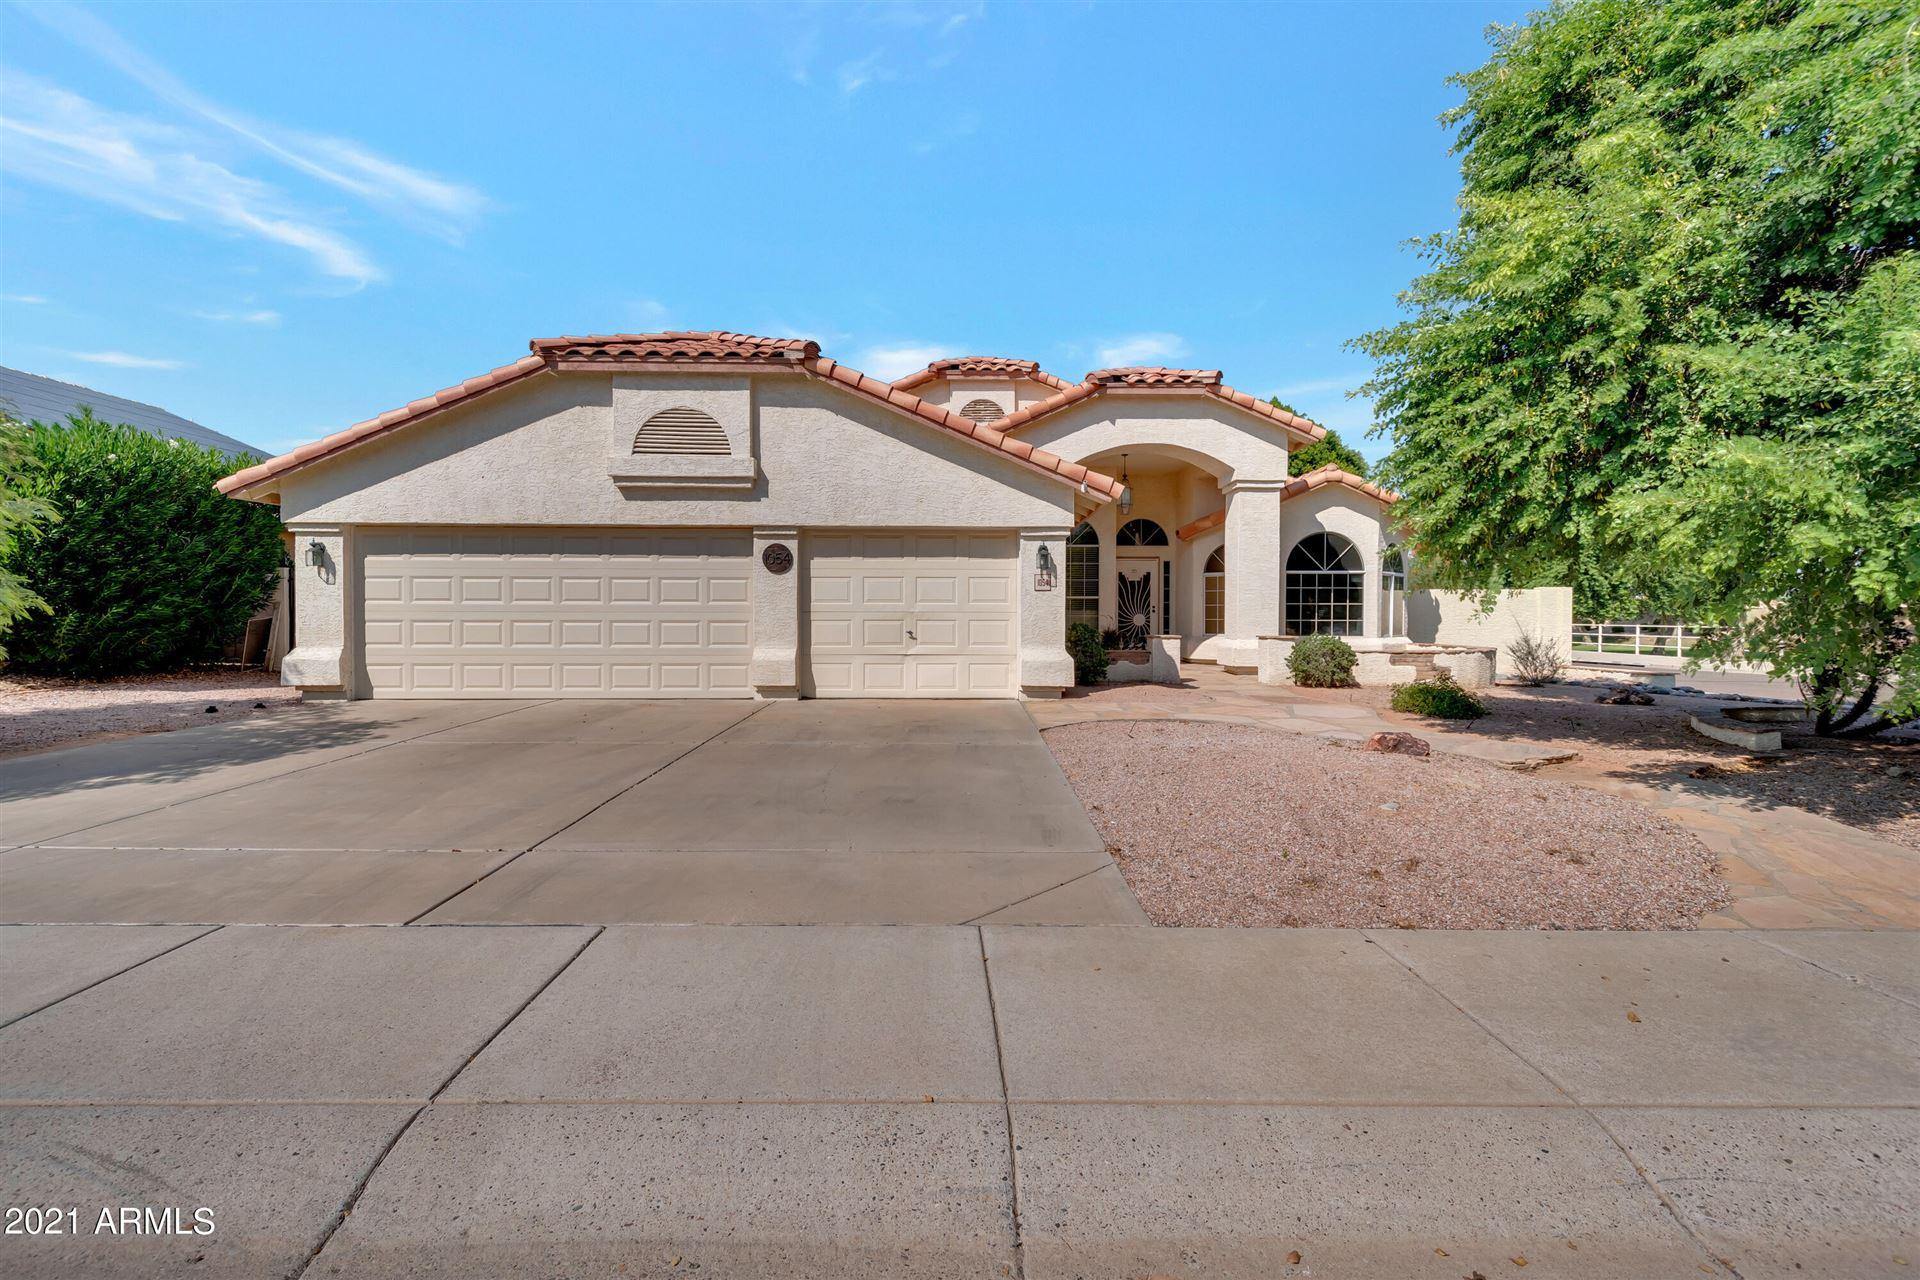 Photo of 1054 W LARONA Lane, Tempe, AZ 85284 (MLS # 6293844)